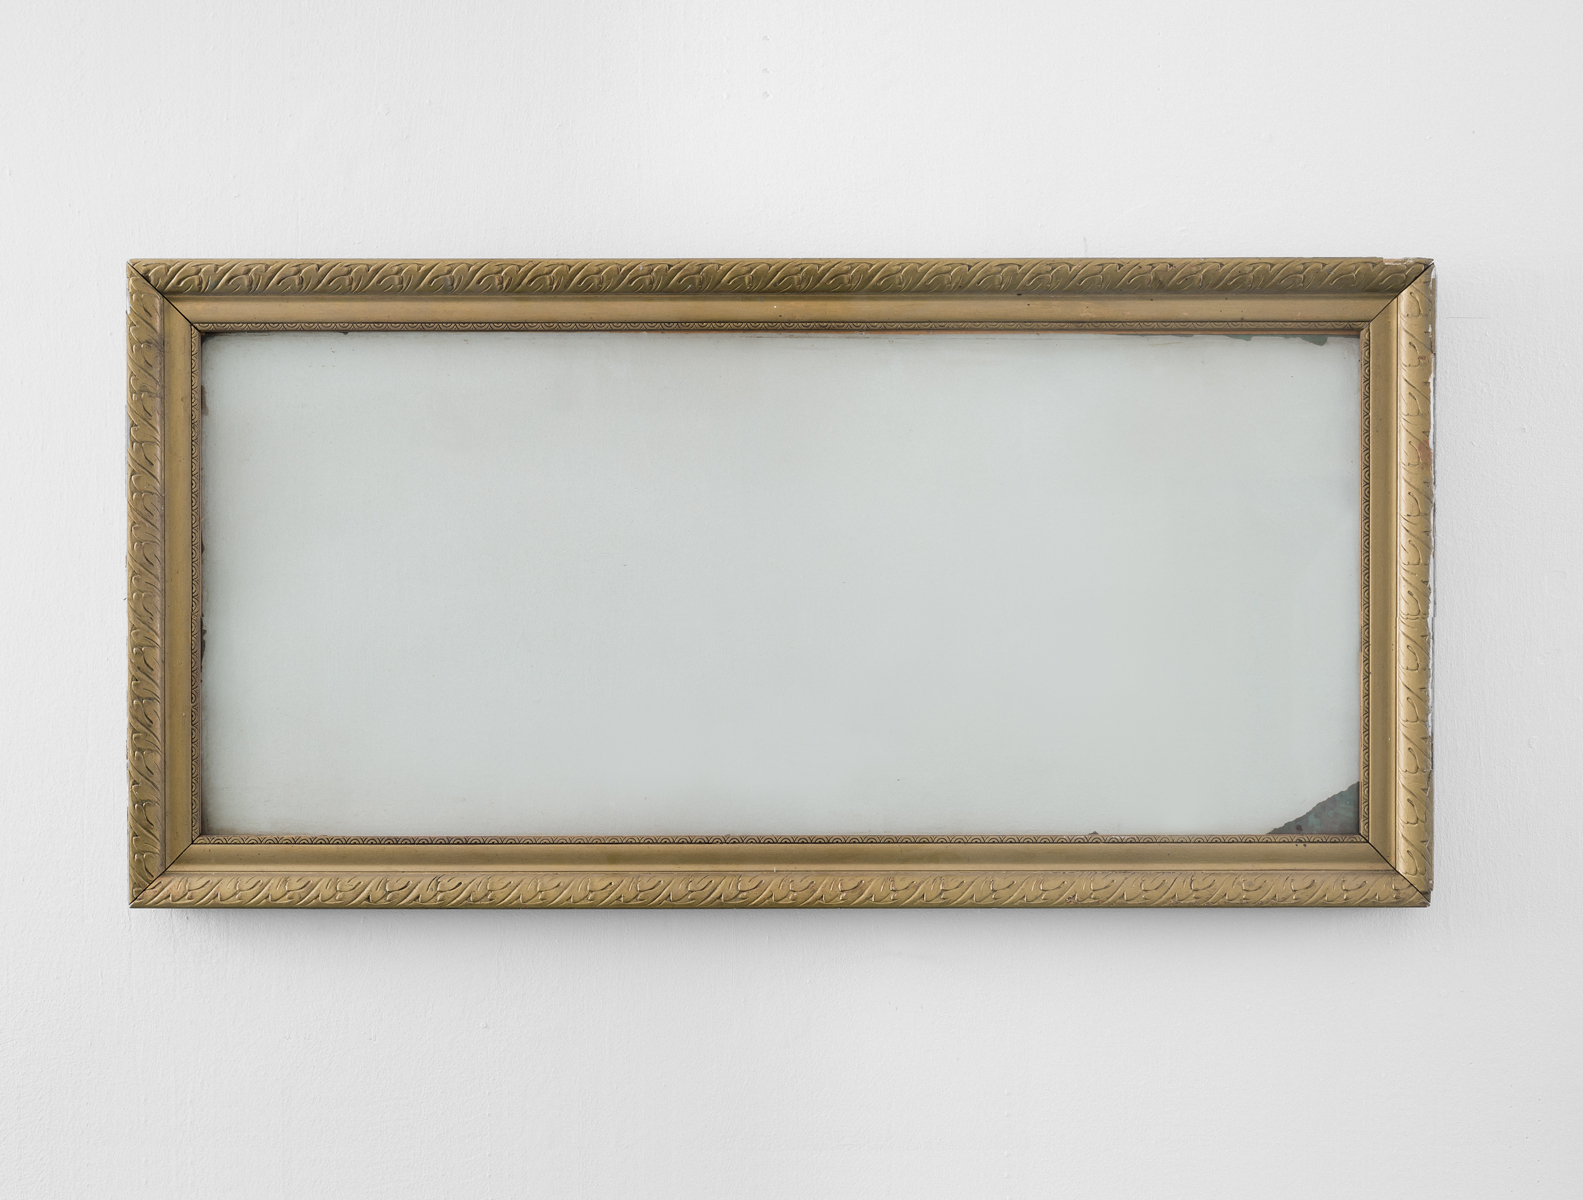 ACTUS PURUS / last supper / 2016 / 132 x 64 x 4 cm / old frames, glass